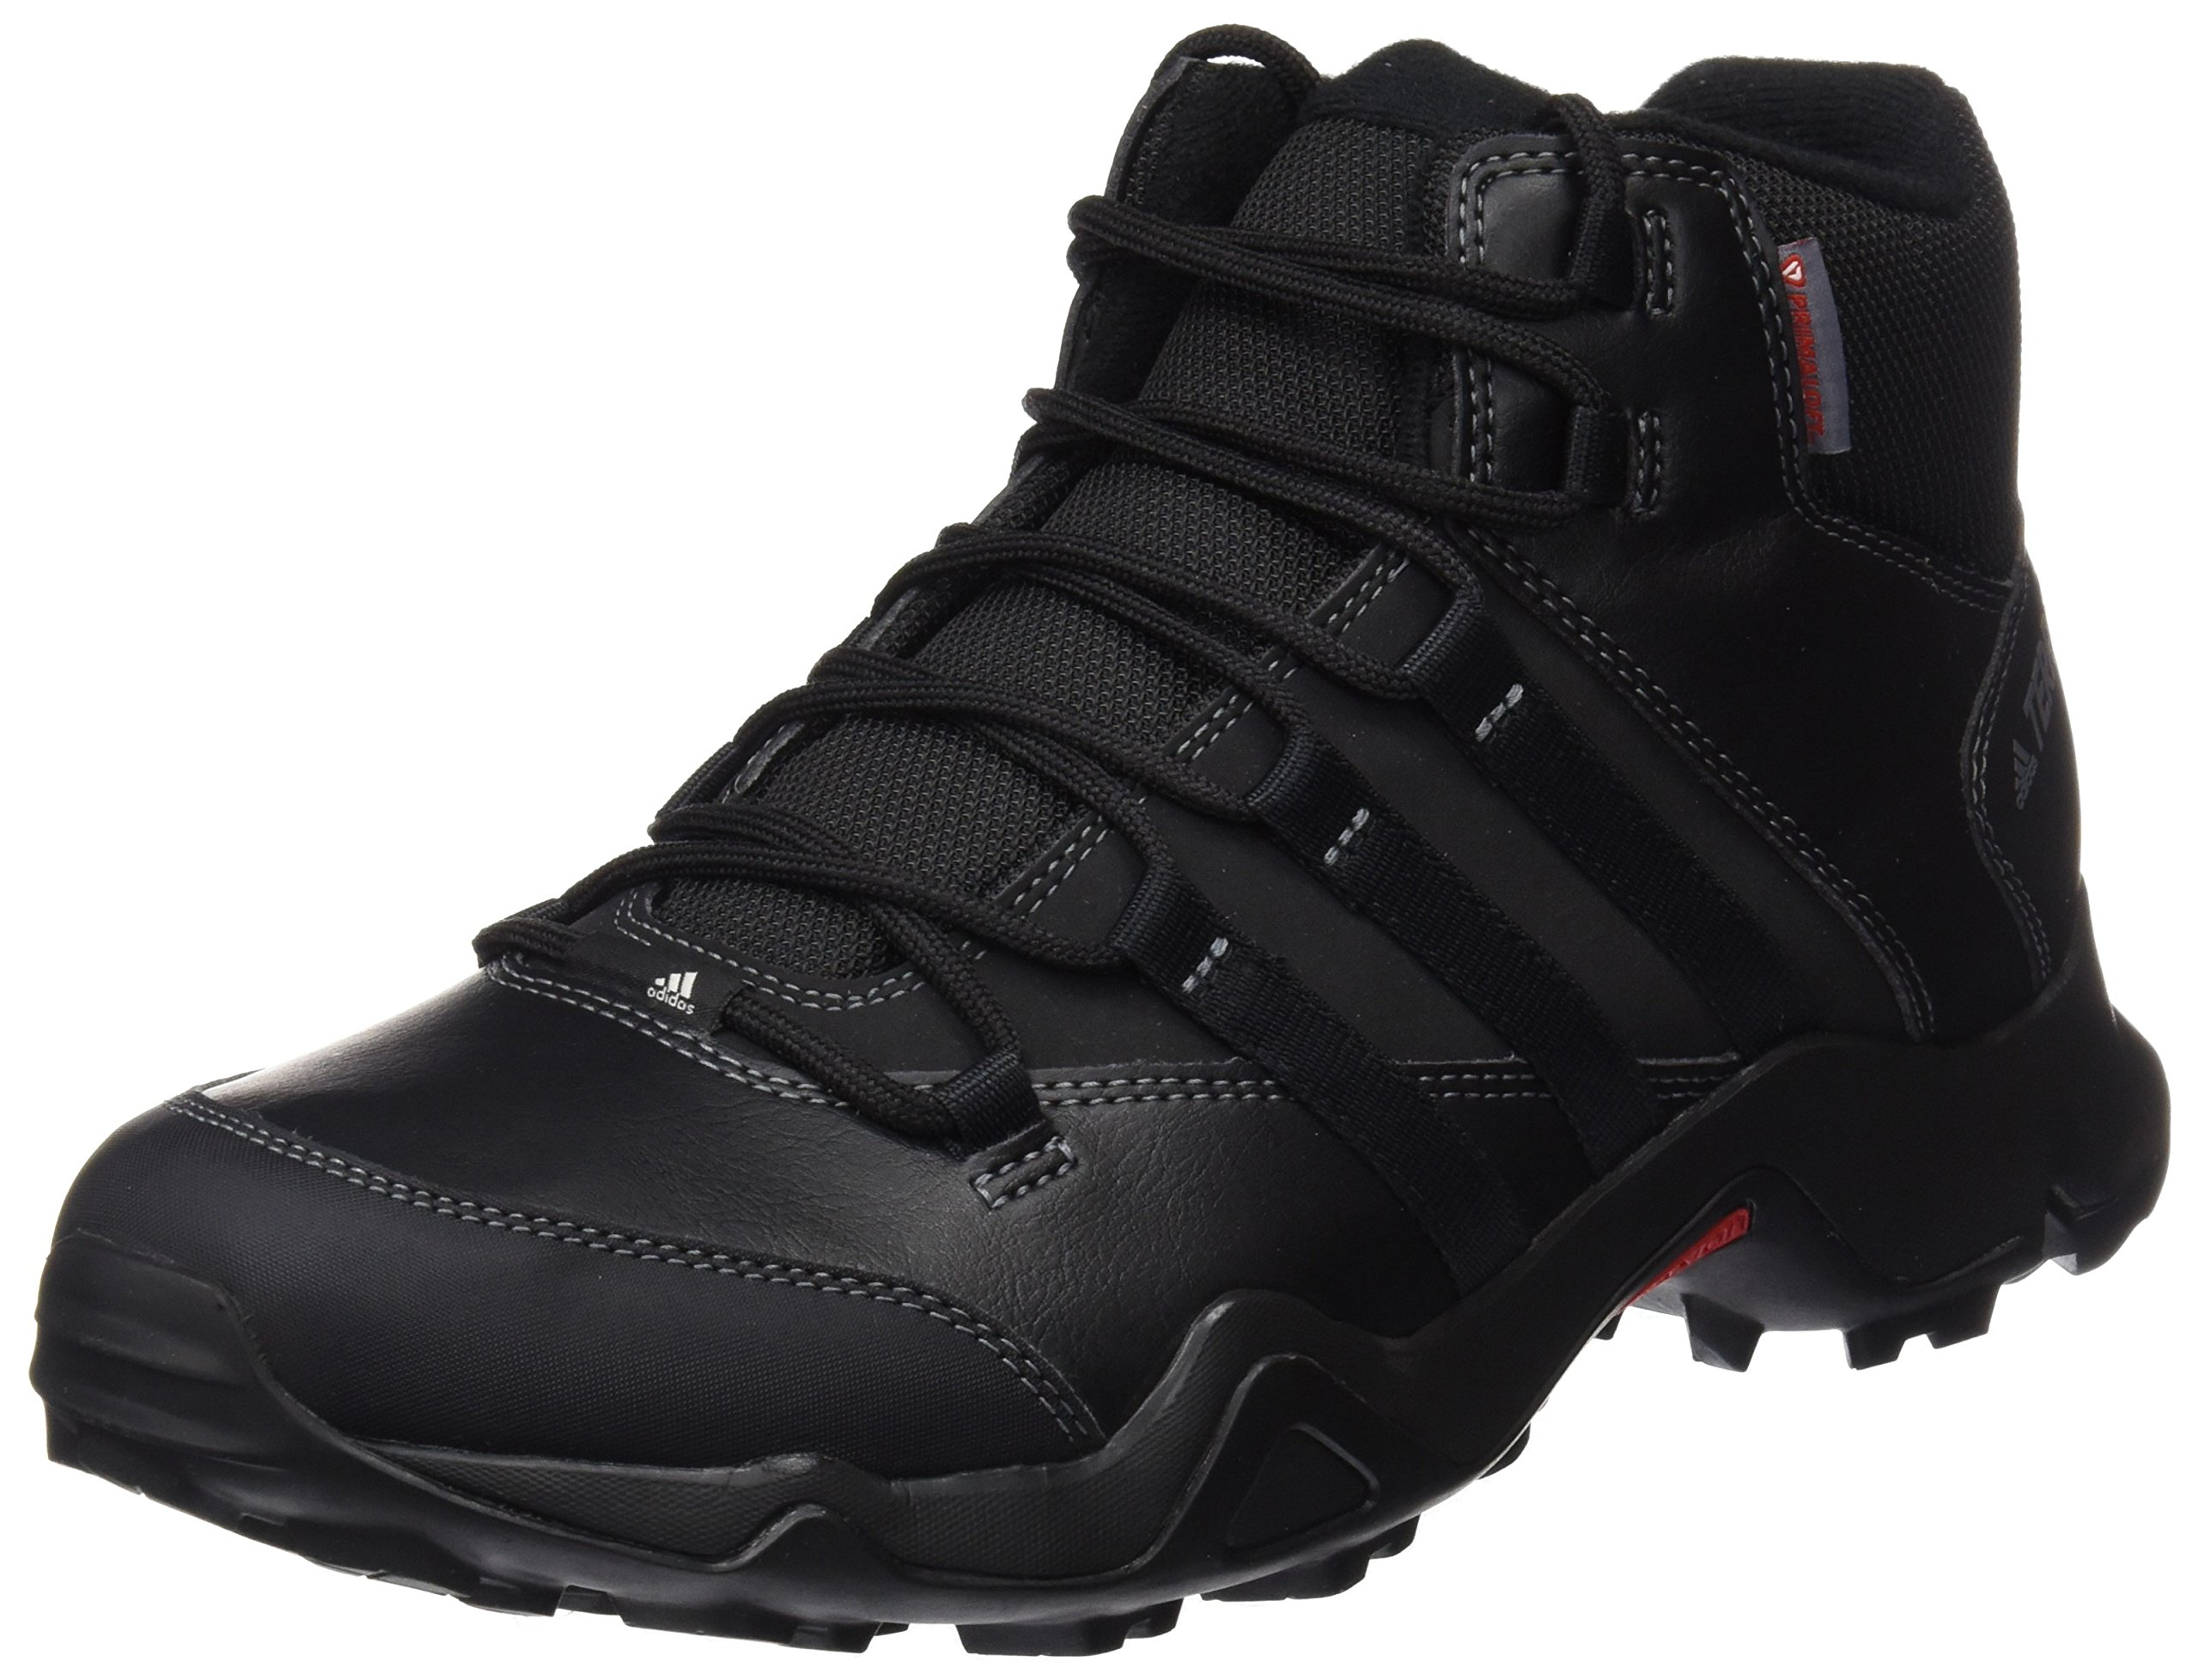 81Y9DoEqH%2BL - adidas Men's Terrex Ax2r Beta Mid Cw High Rise Hiking Boots